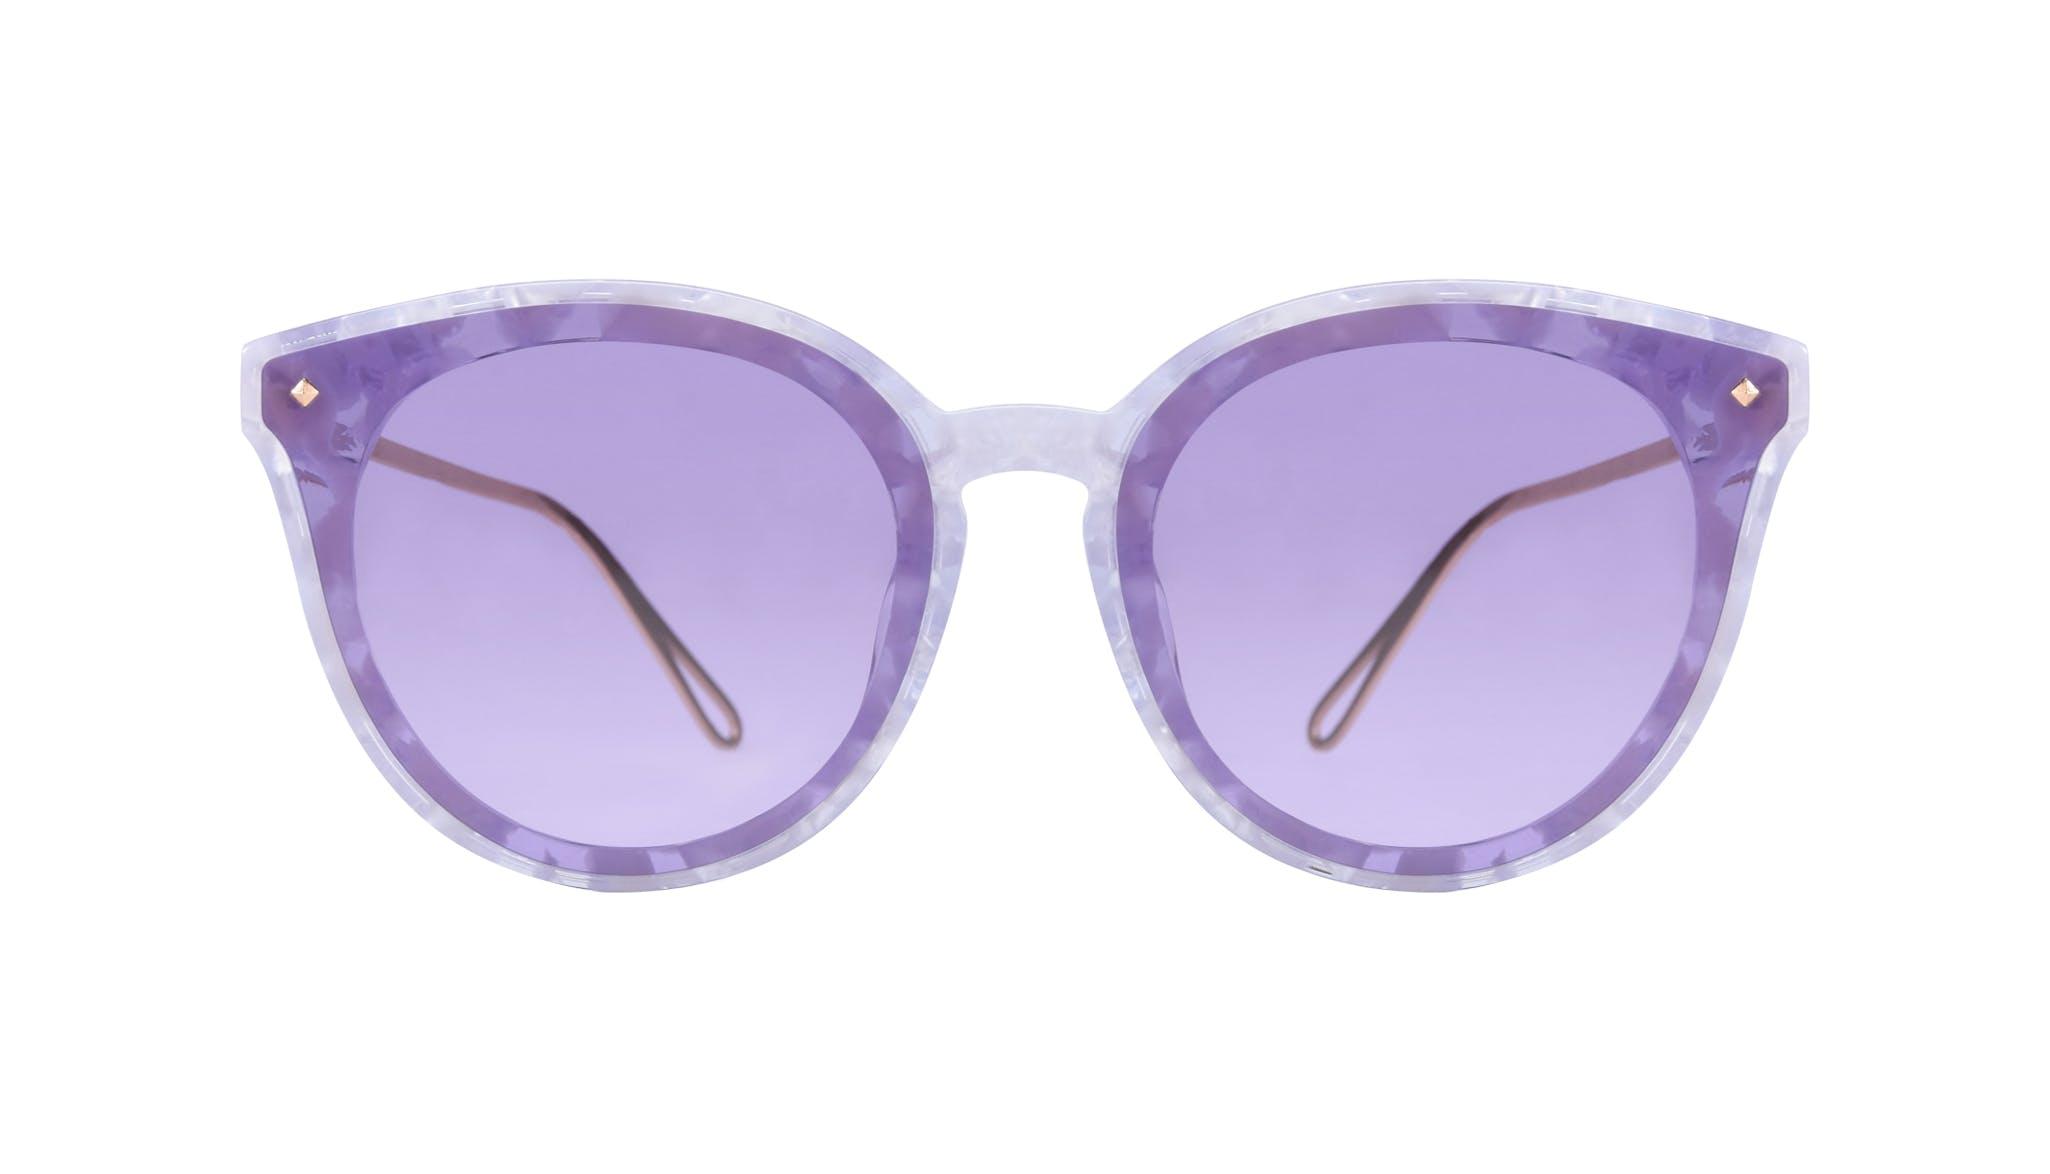 Affordable Fashion Glasses Cat Eye Sunglasses Women Icone Moonlight